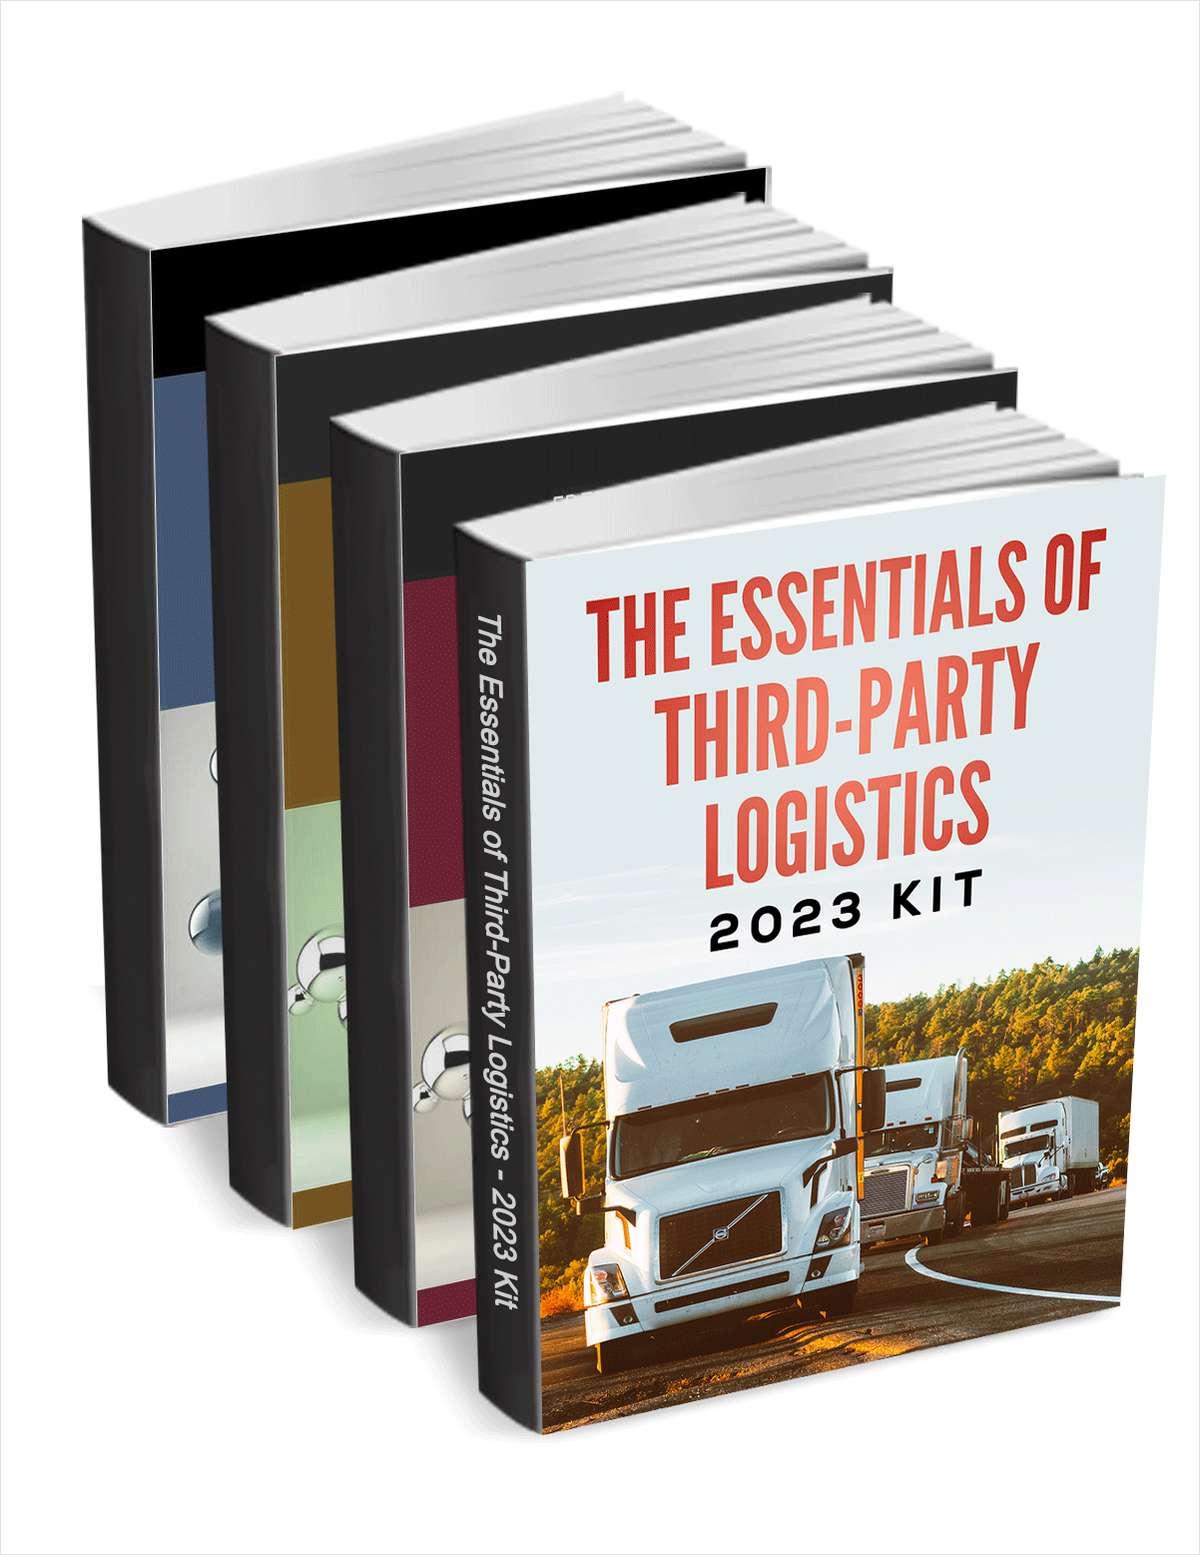 The Essentials of Third-Party Logistics (3PL) - 2020 Kit